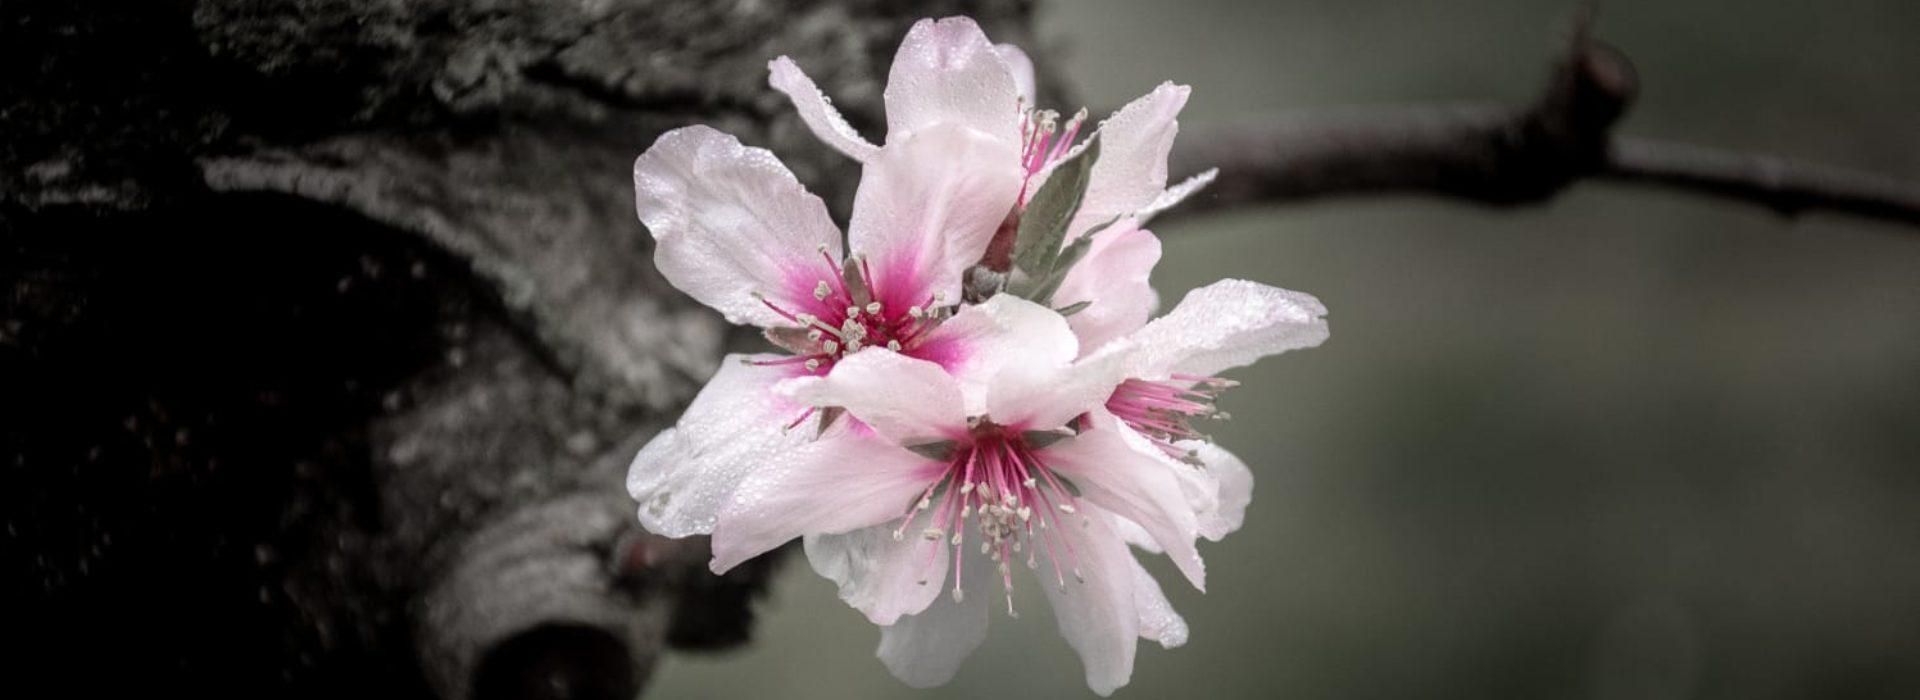 Floral Energy 4 U